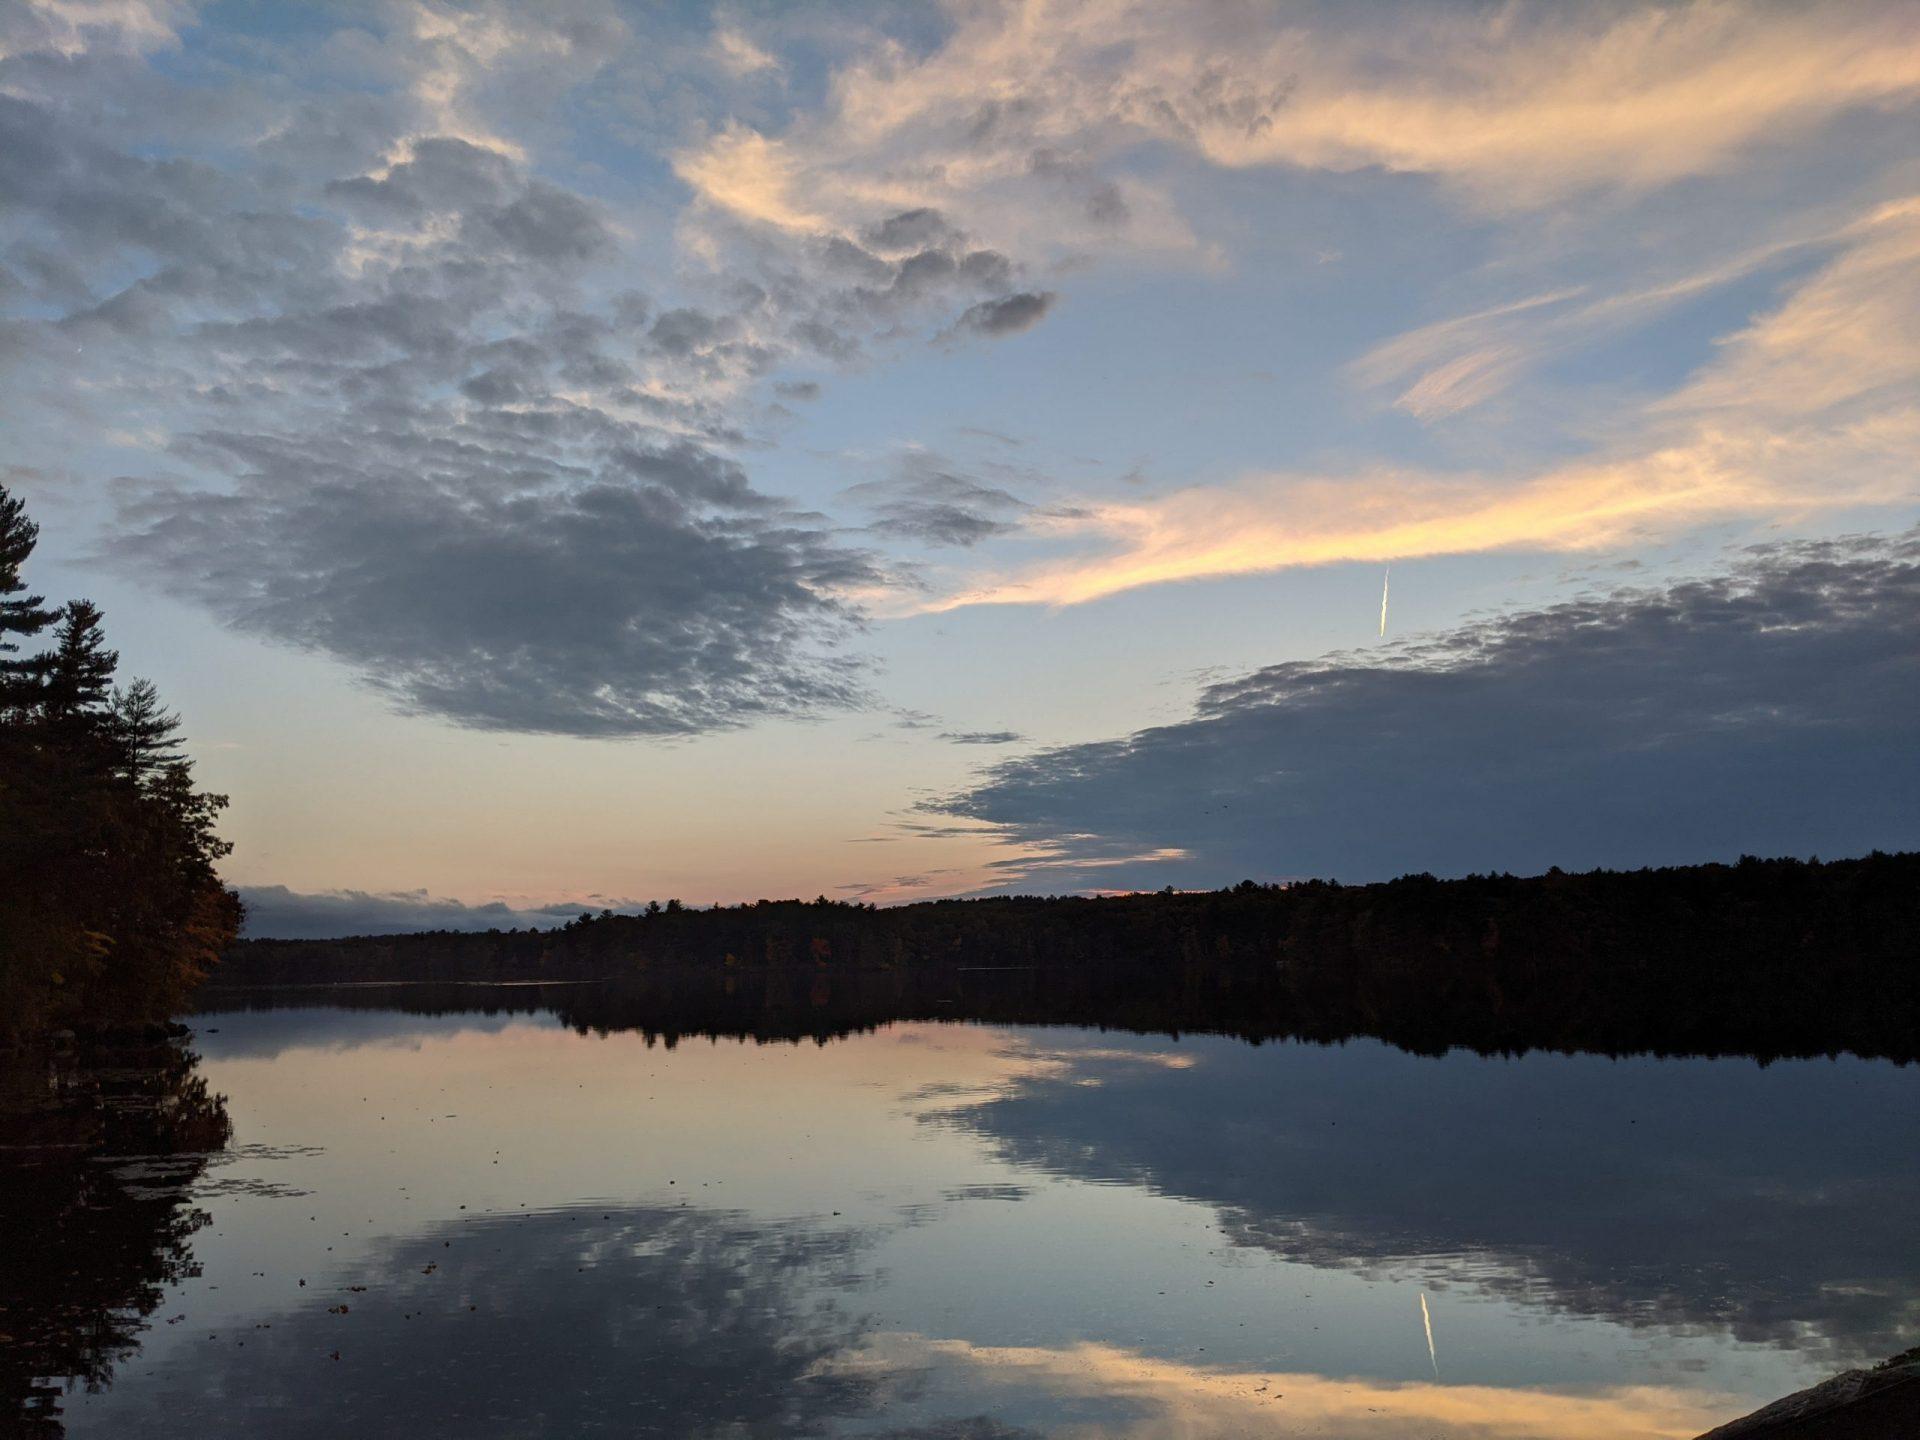 Oct 22,2020 Ashland State Park